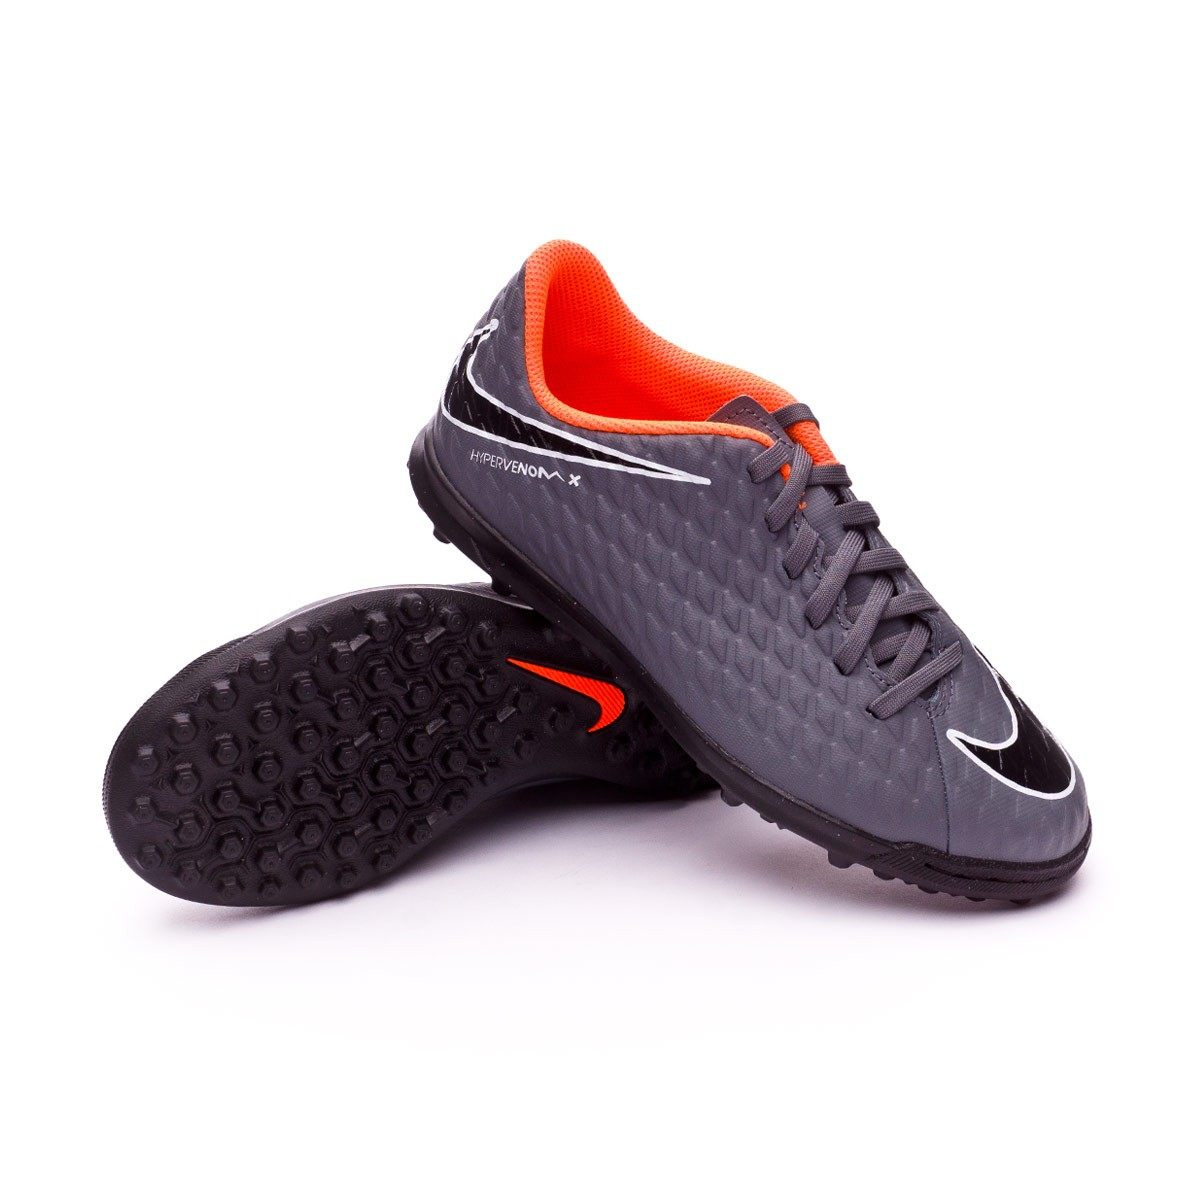 0691b70fd9a78 Football Boot Nike Kids Hypervenom PhantomX III Club Turf Dark grey ...